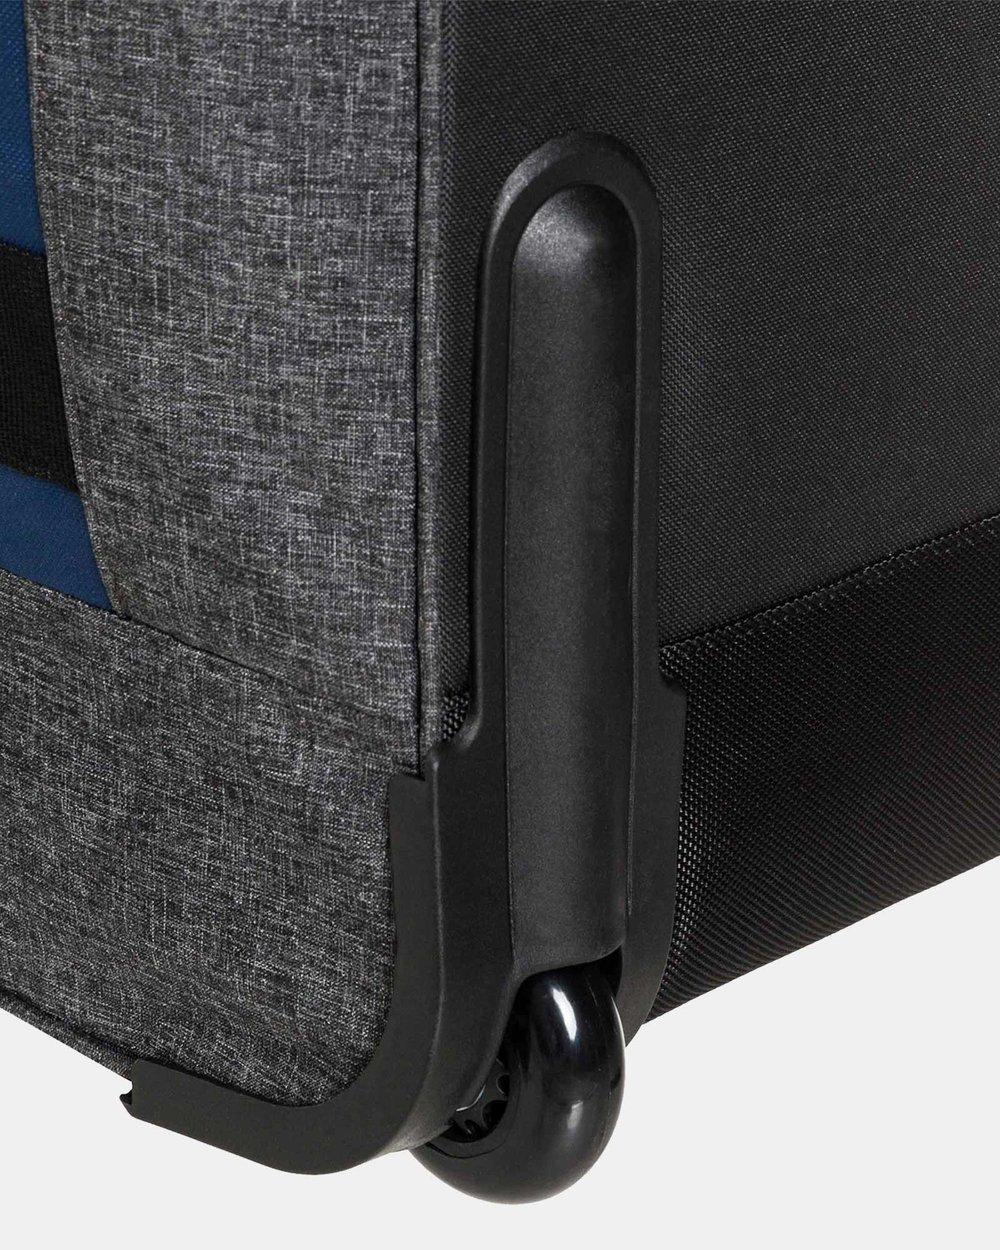 New Centurion Wheeled Travel Bag by Quiksilver Online  bea7840d61c30